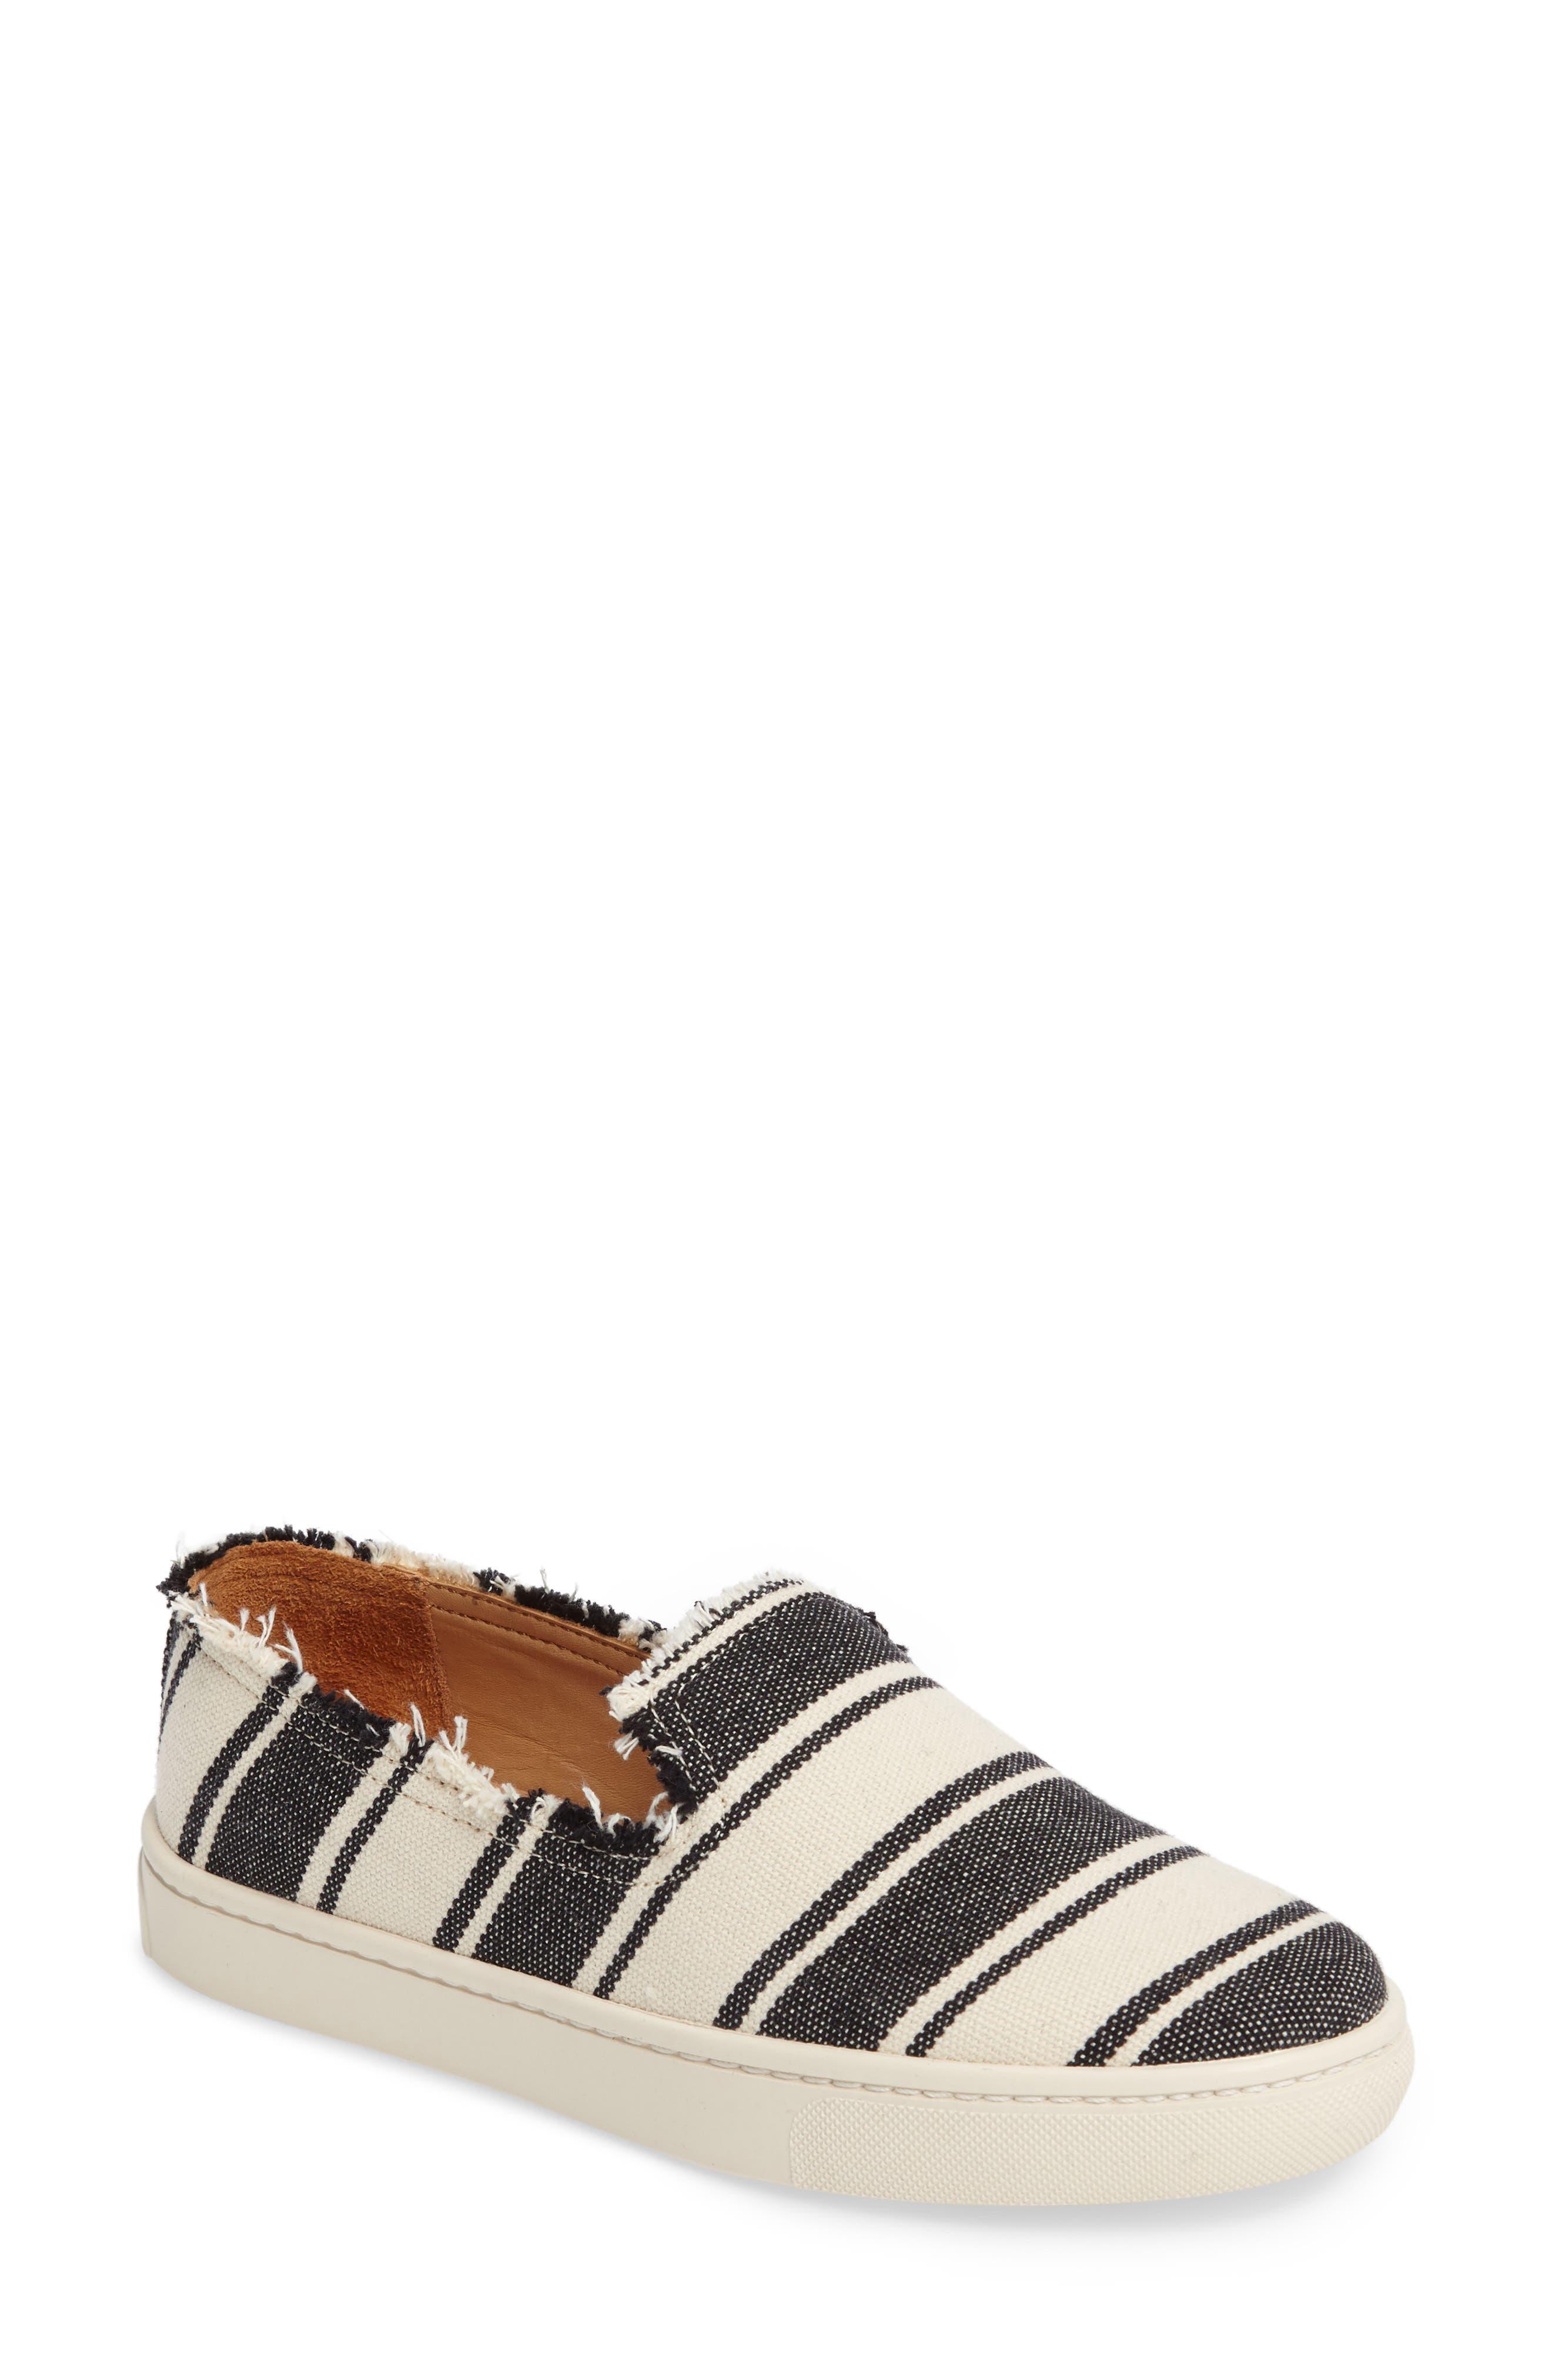 Soludos Stripe Slip-On Sneaker (Women)